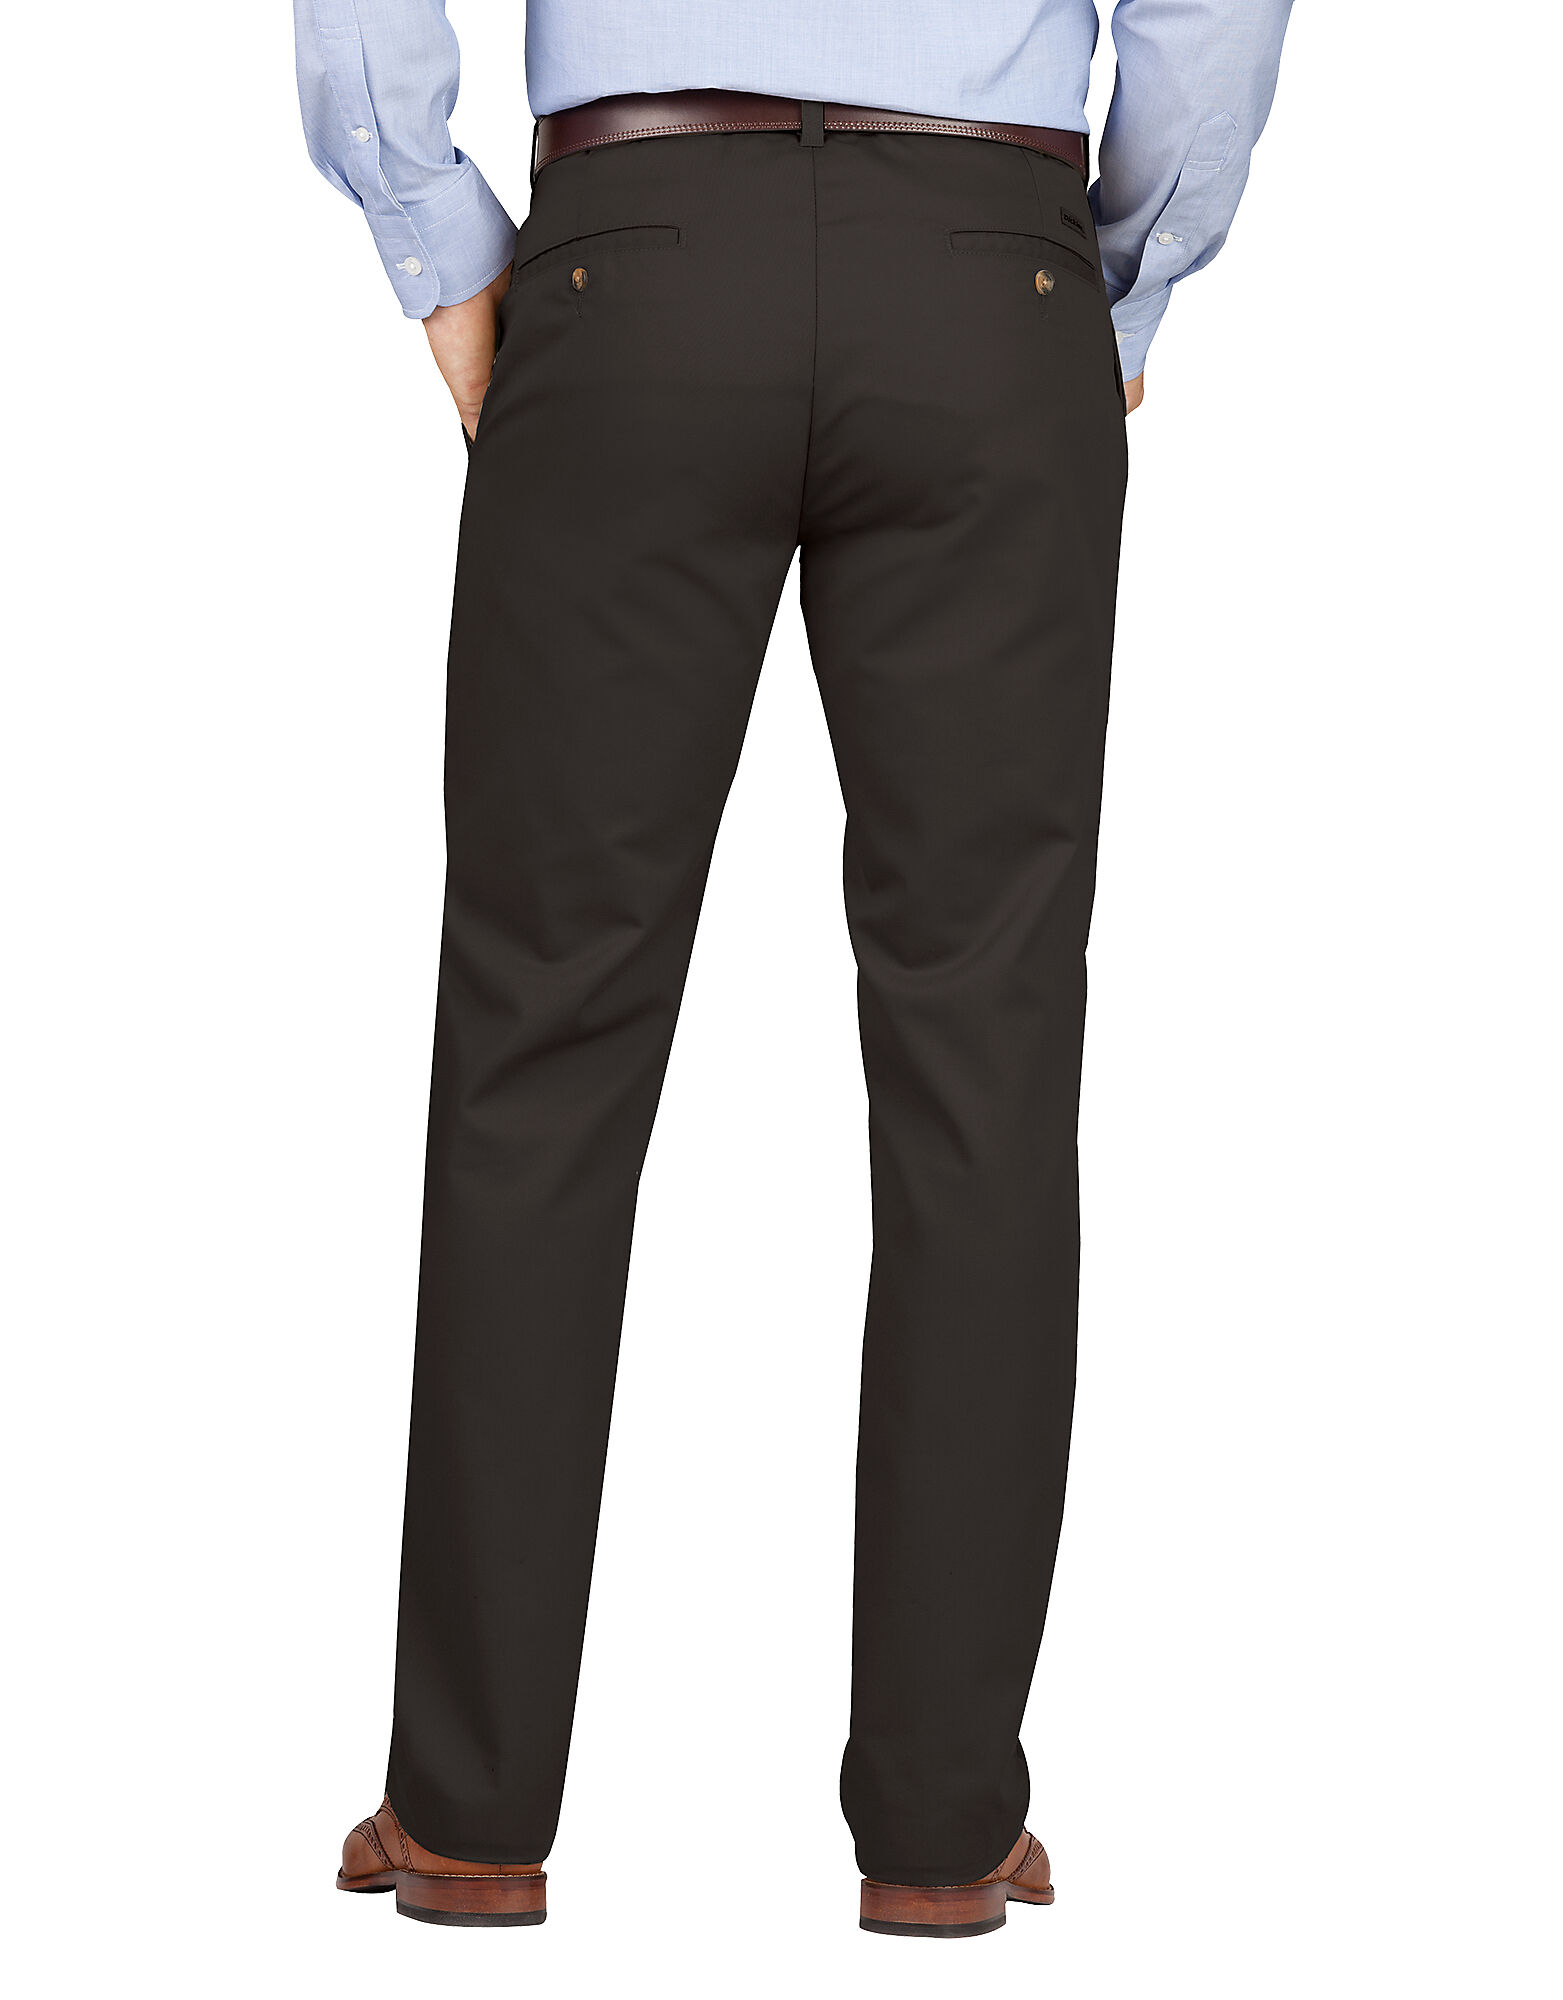 mens dress pants fit guide